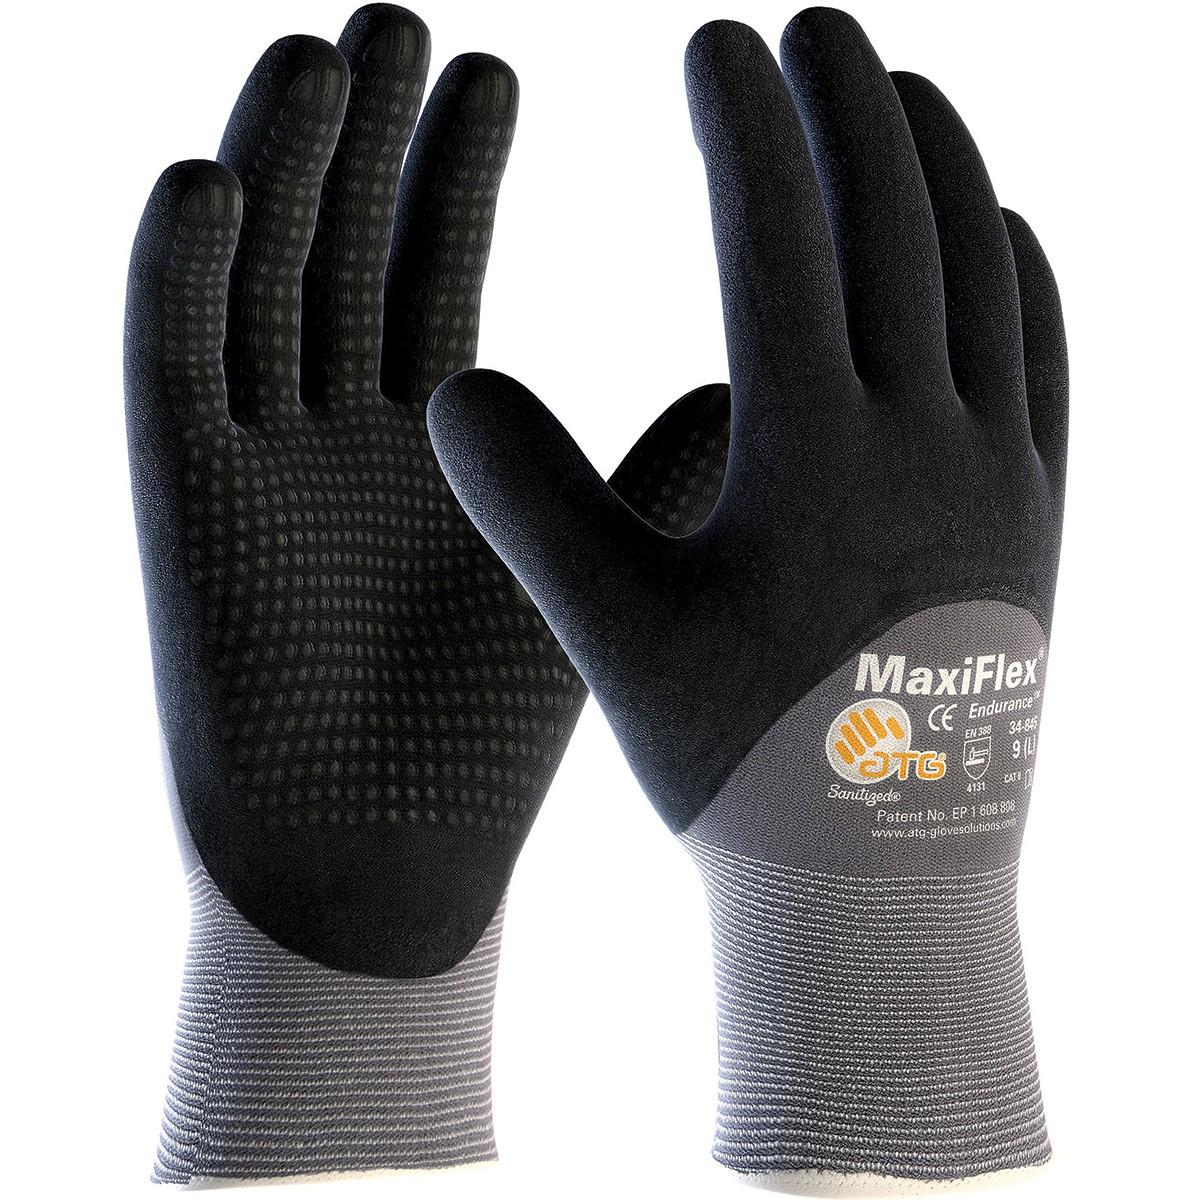 Pip 34 845 Maxiflex Endurance Seamless Knit Nylon Gloves